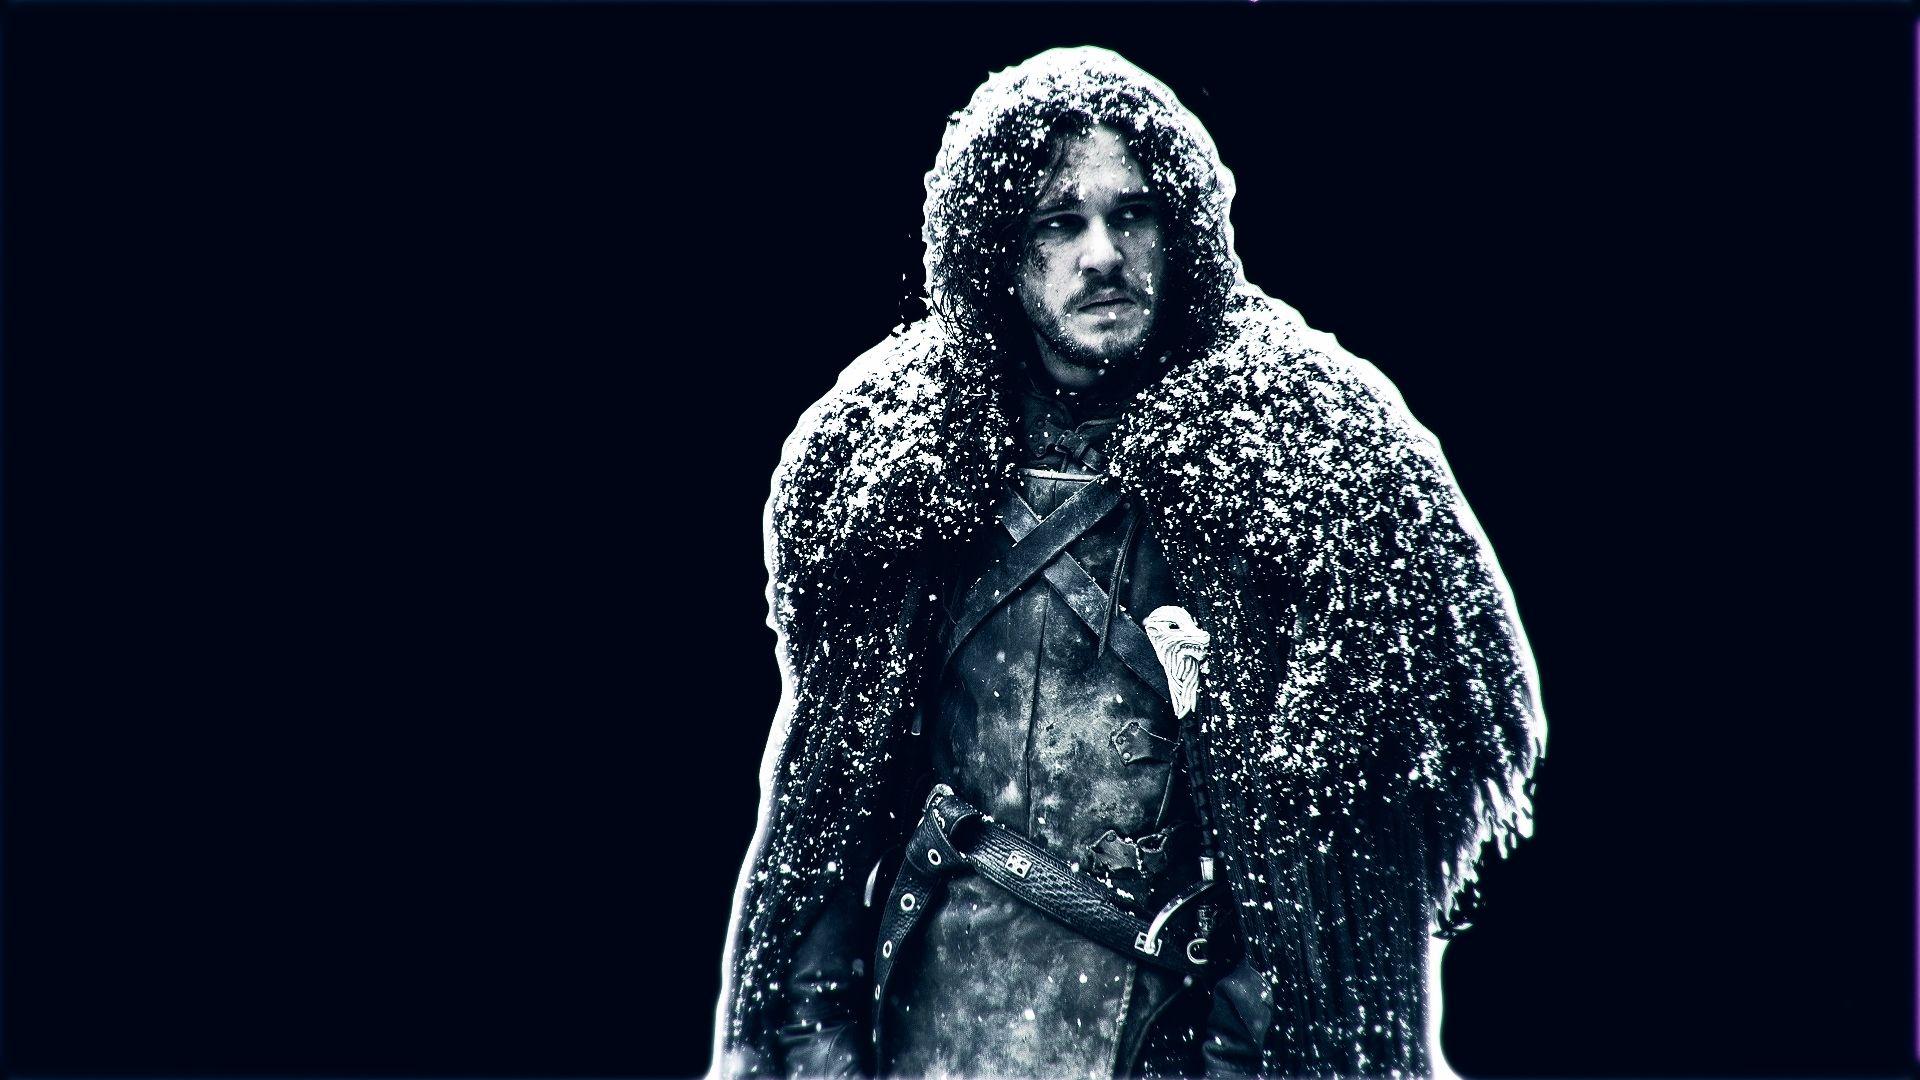 Jon Snow Game of Thrones Minimalist